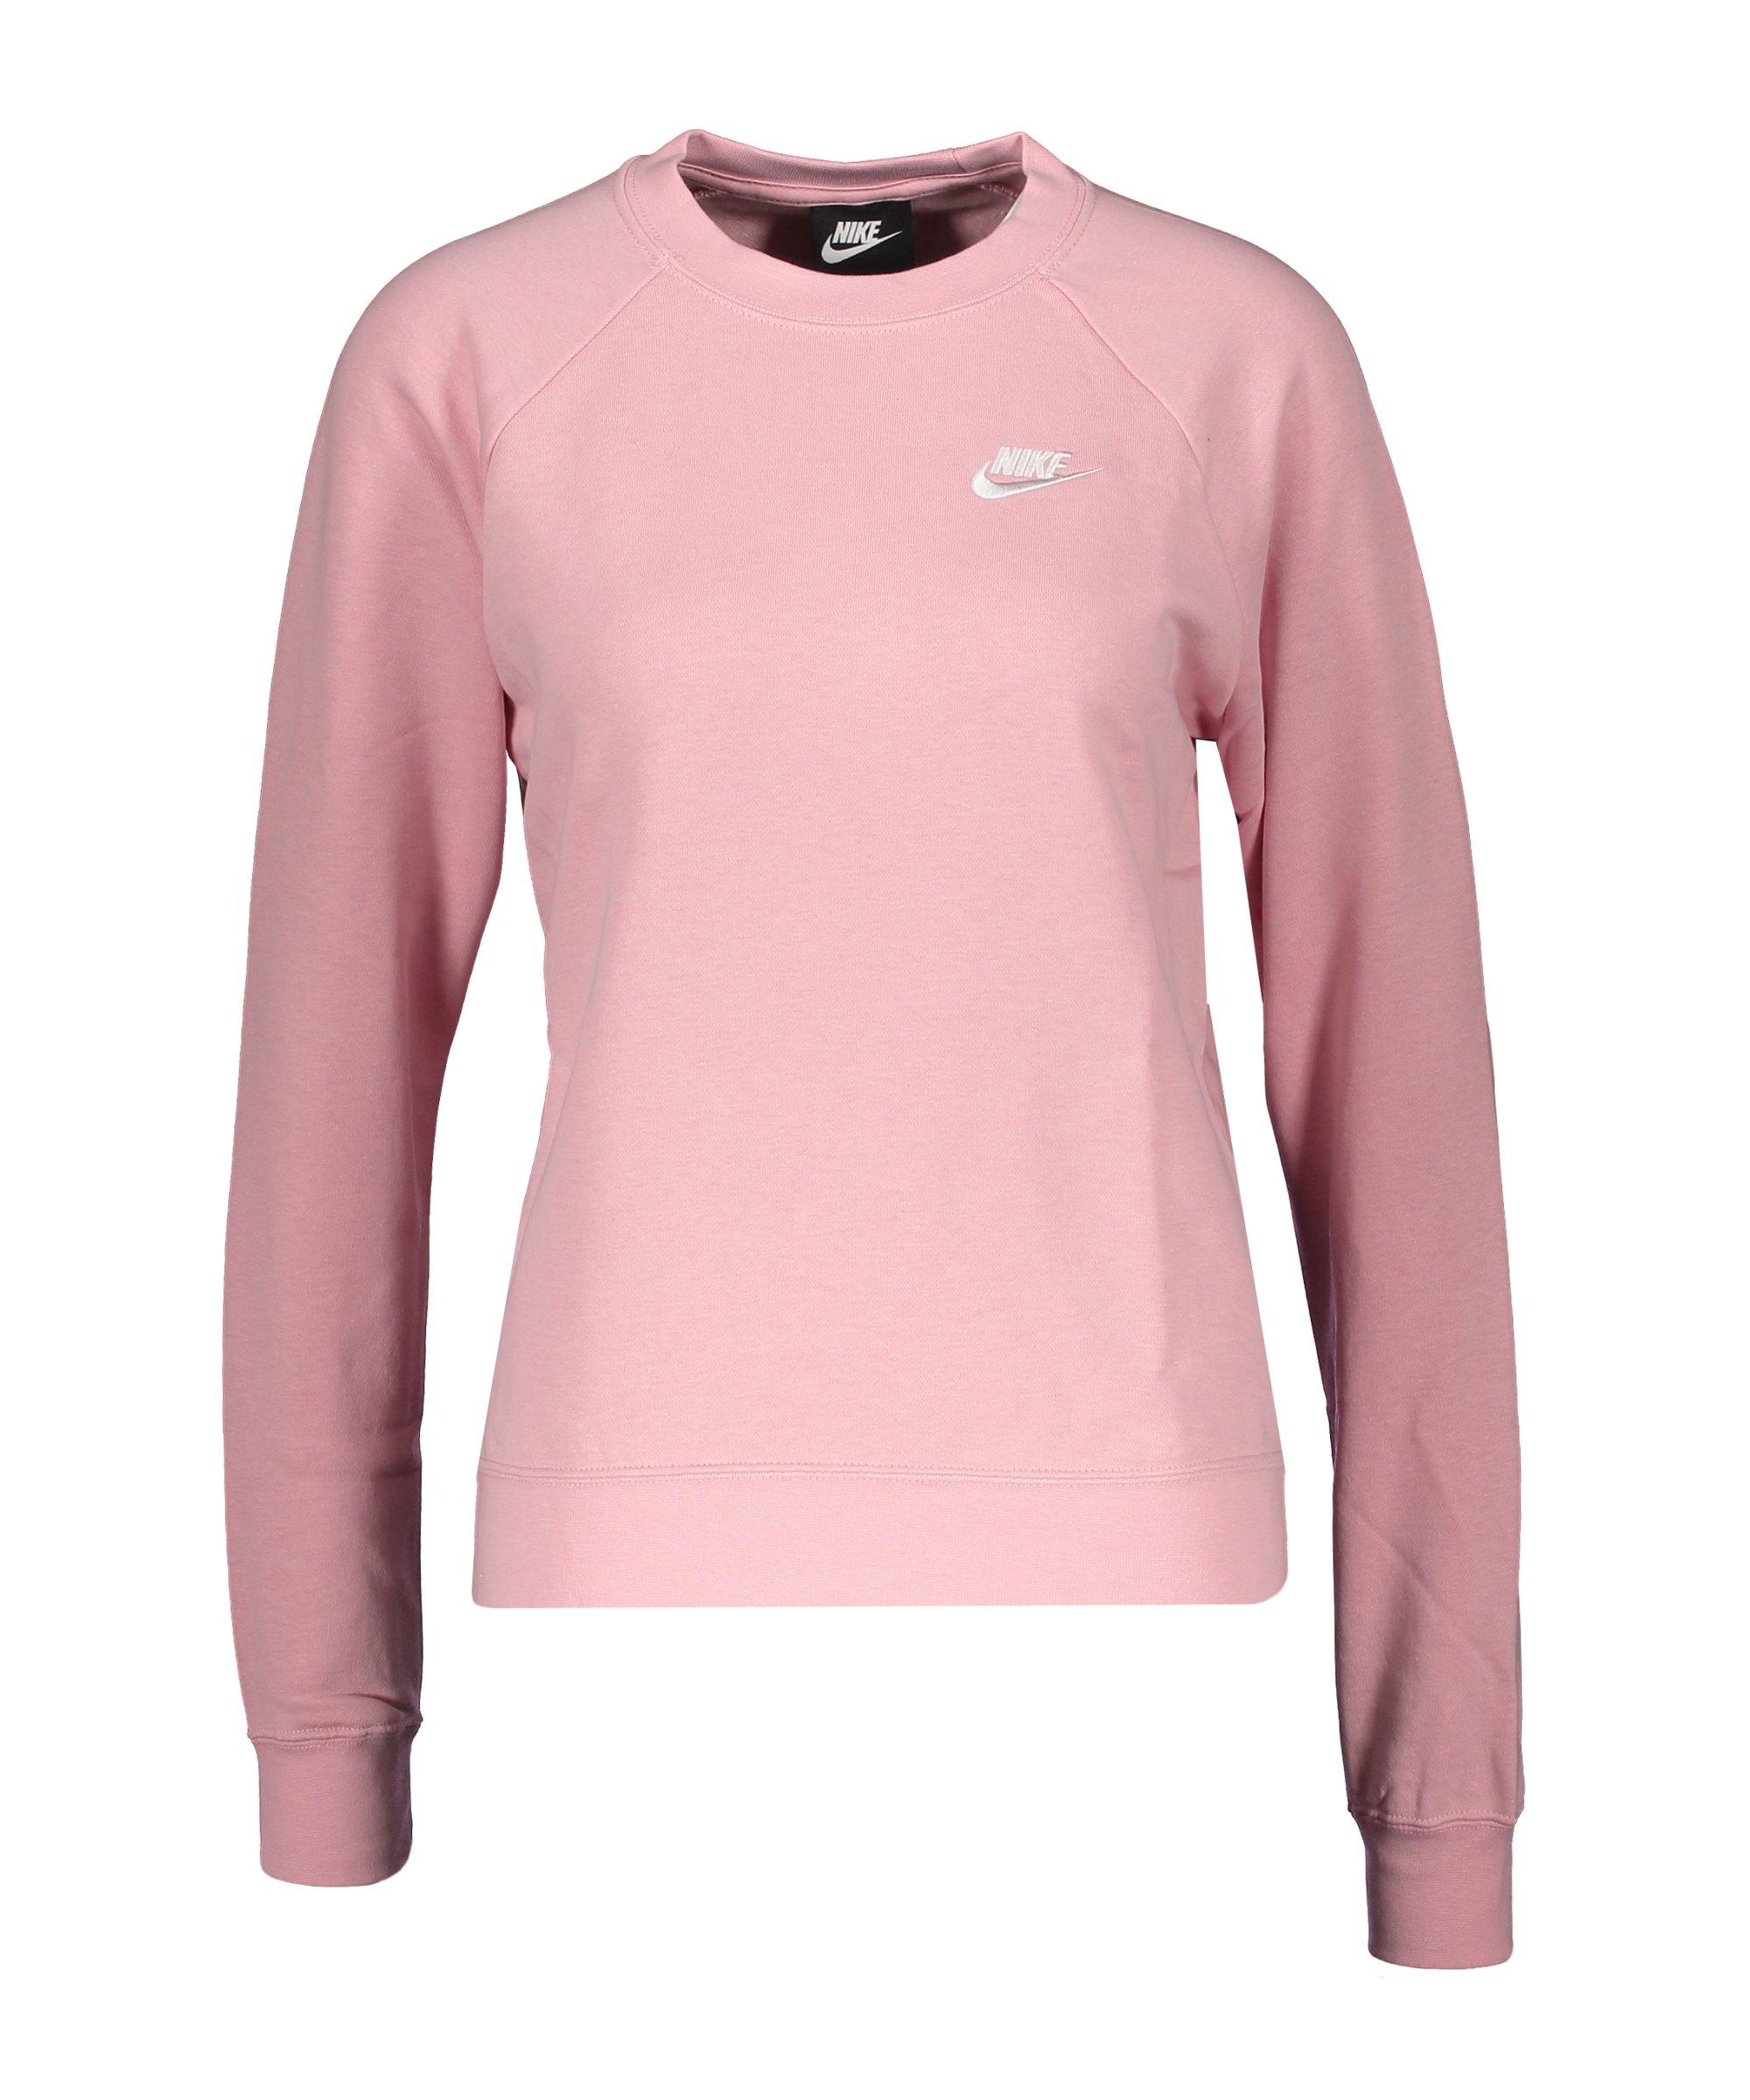 Nike Essential Fleece Sweatshirt Damen Rosa F632 - rosa